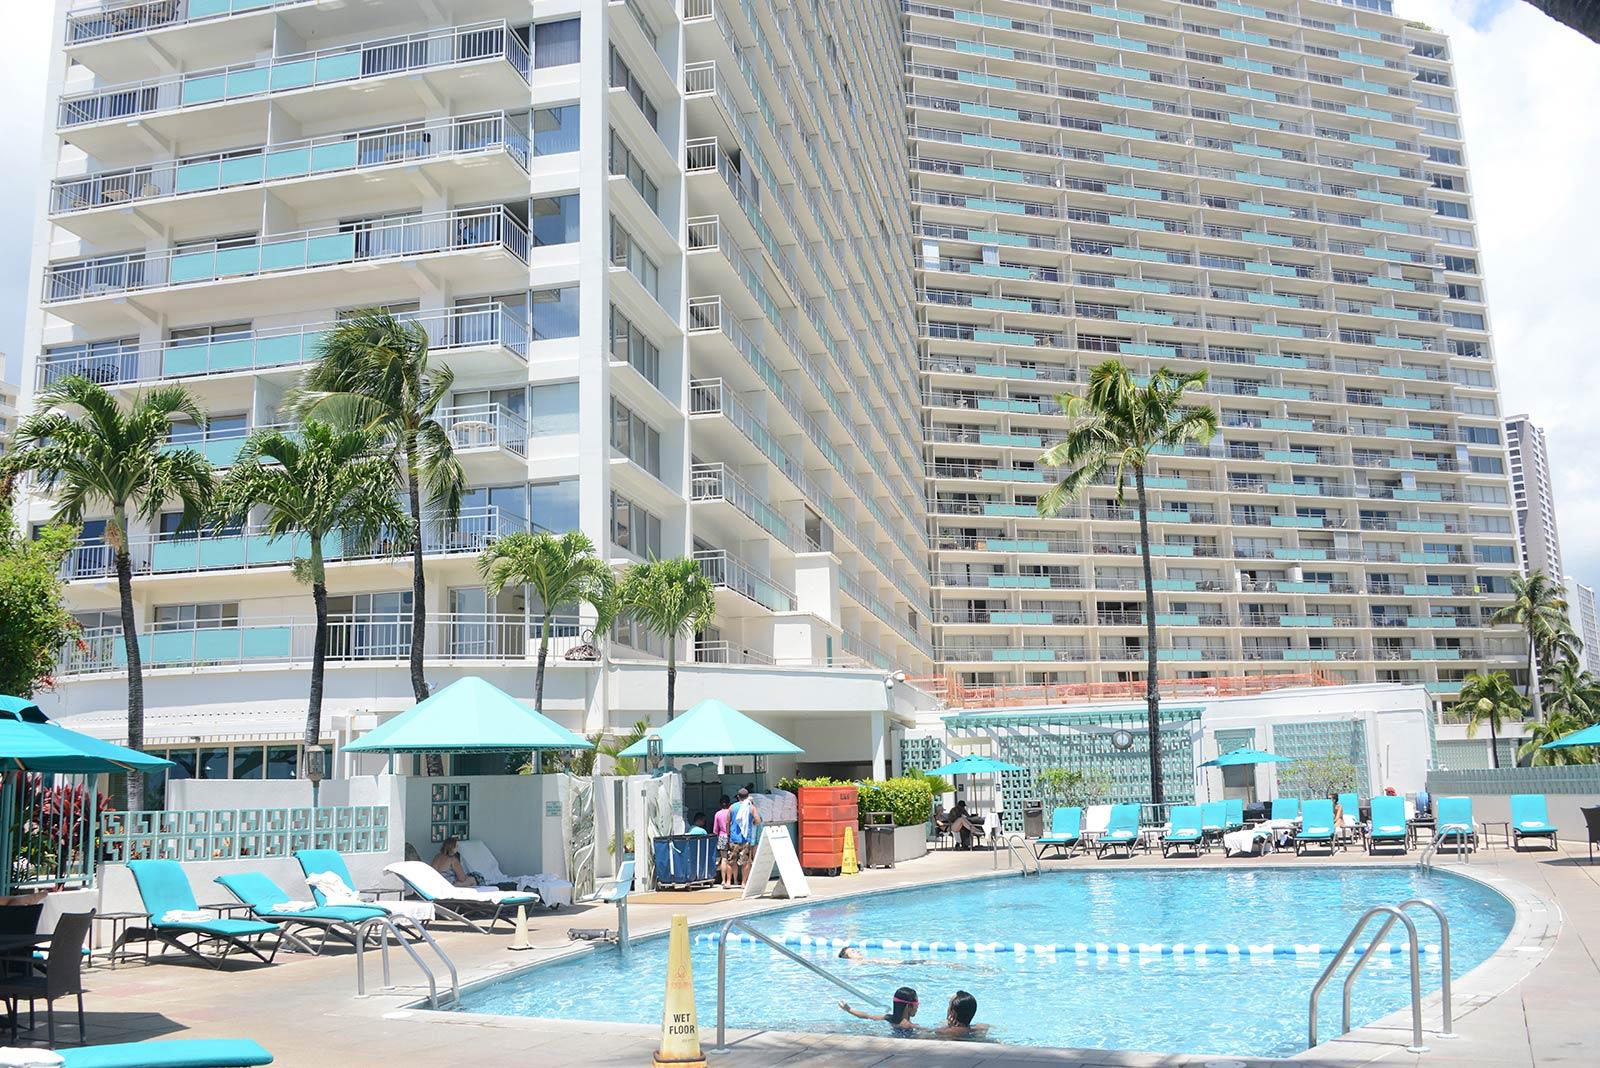 shell-vacations-hawaii-shell-owners-club-hawaii-5